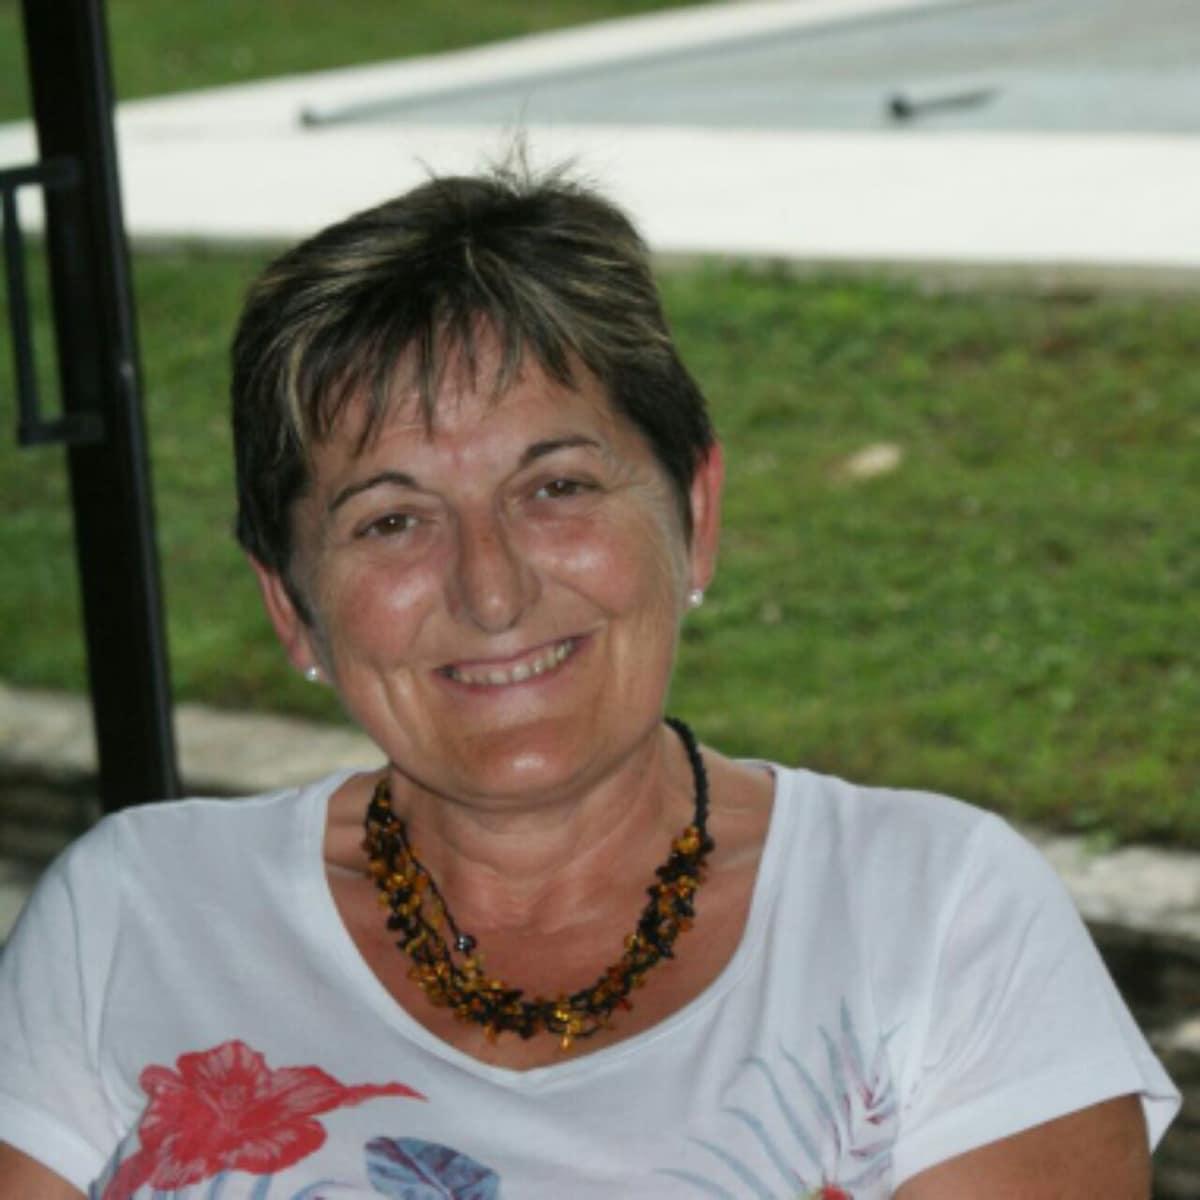 Sylviane from Saint-Cannat